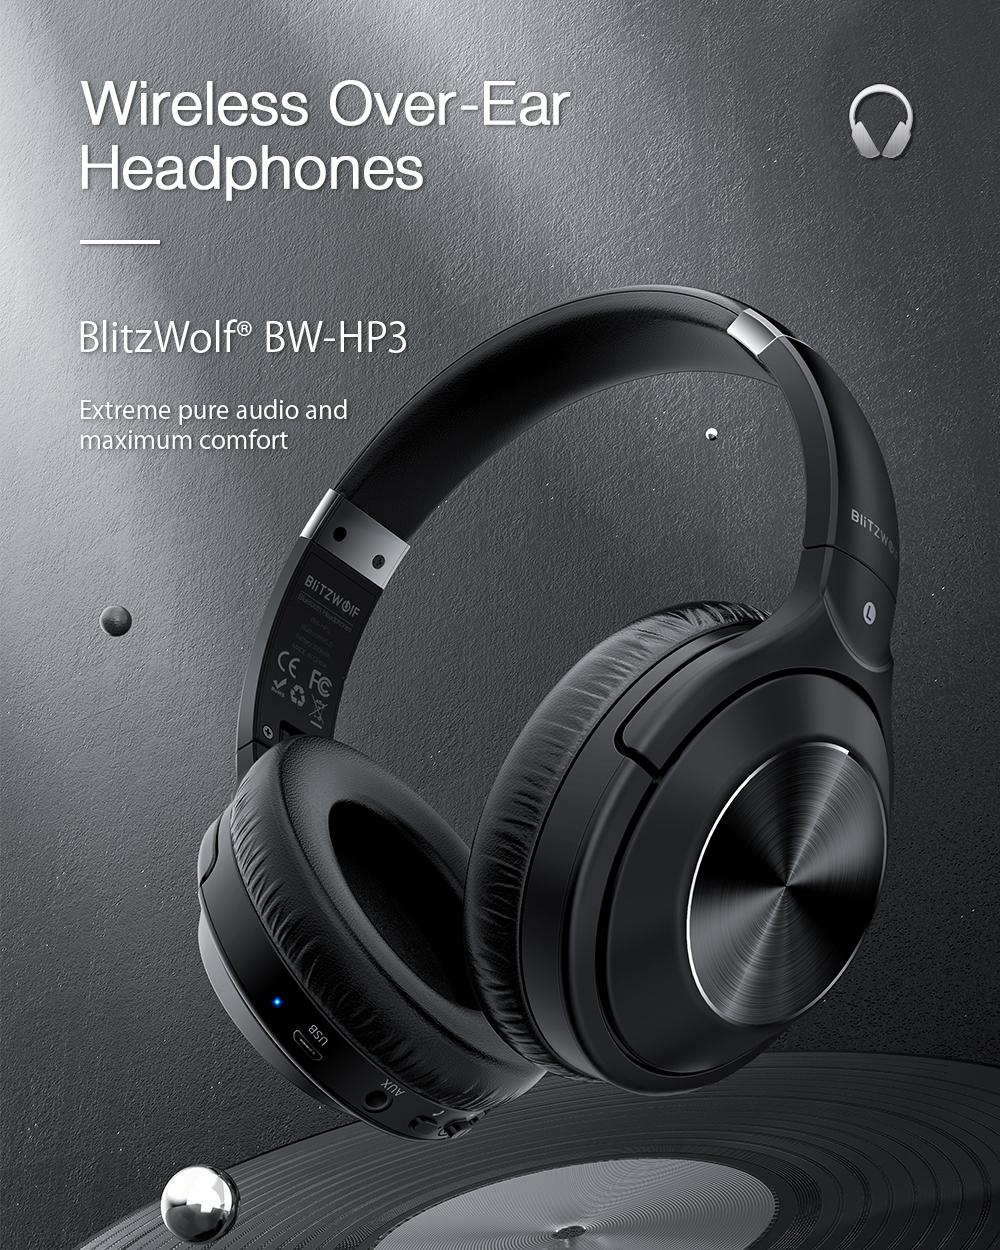 Blitwolf BW-HP3 headphone